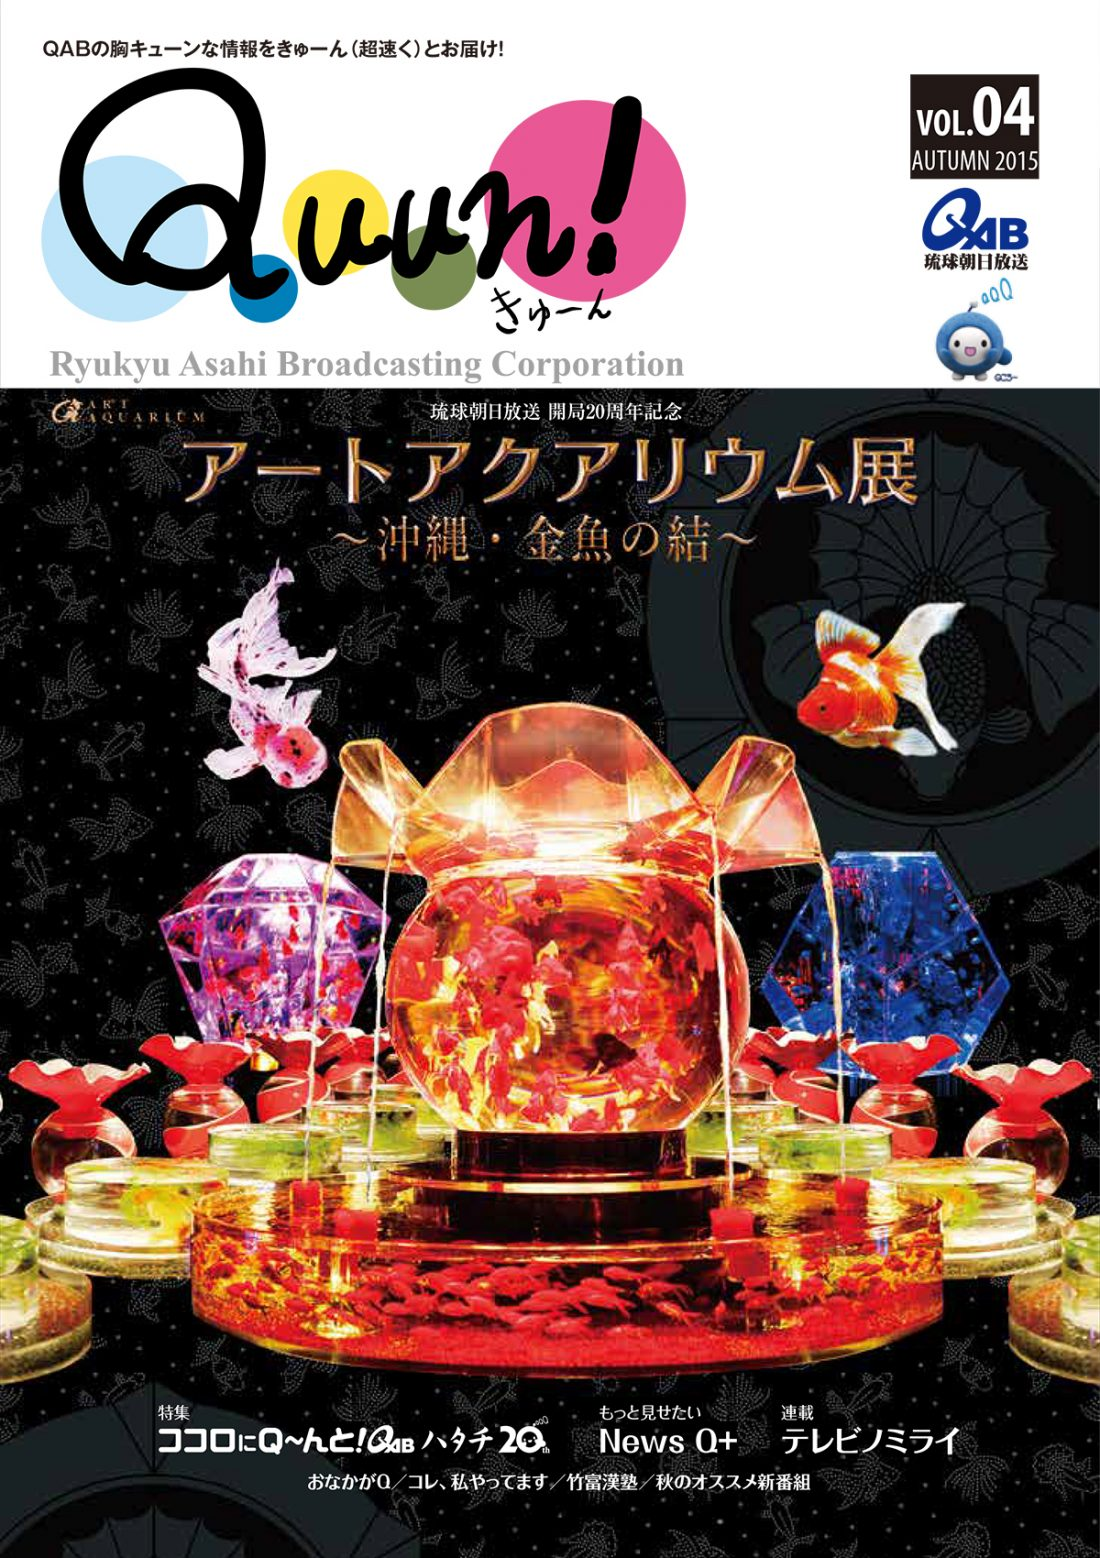 http://www.qab.co.jp/qgoro/wp-content/uploads/quun_0401-1100x1558.jpg